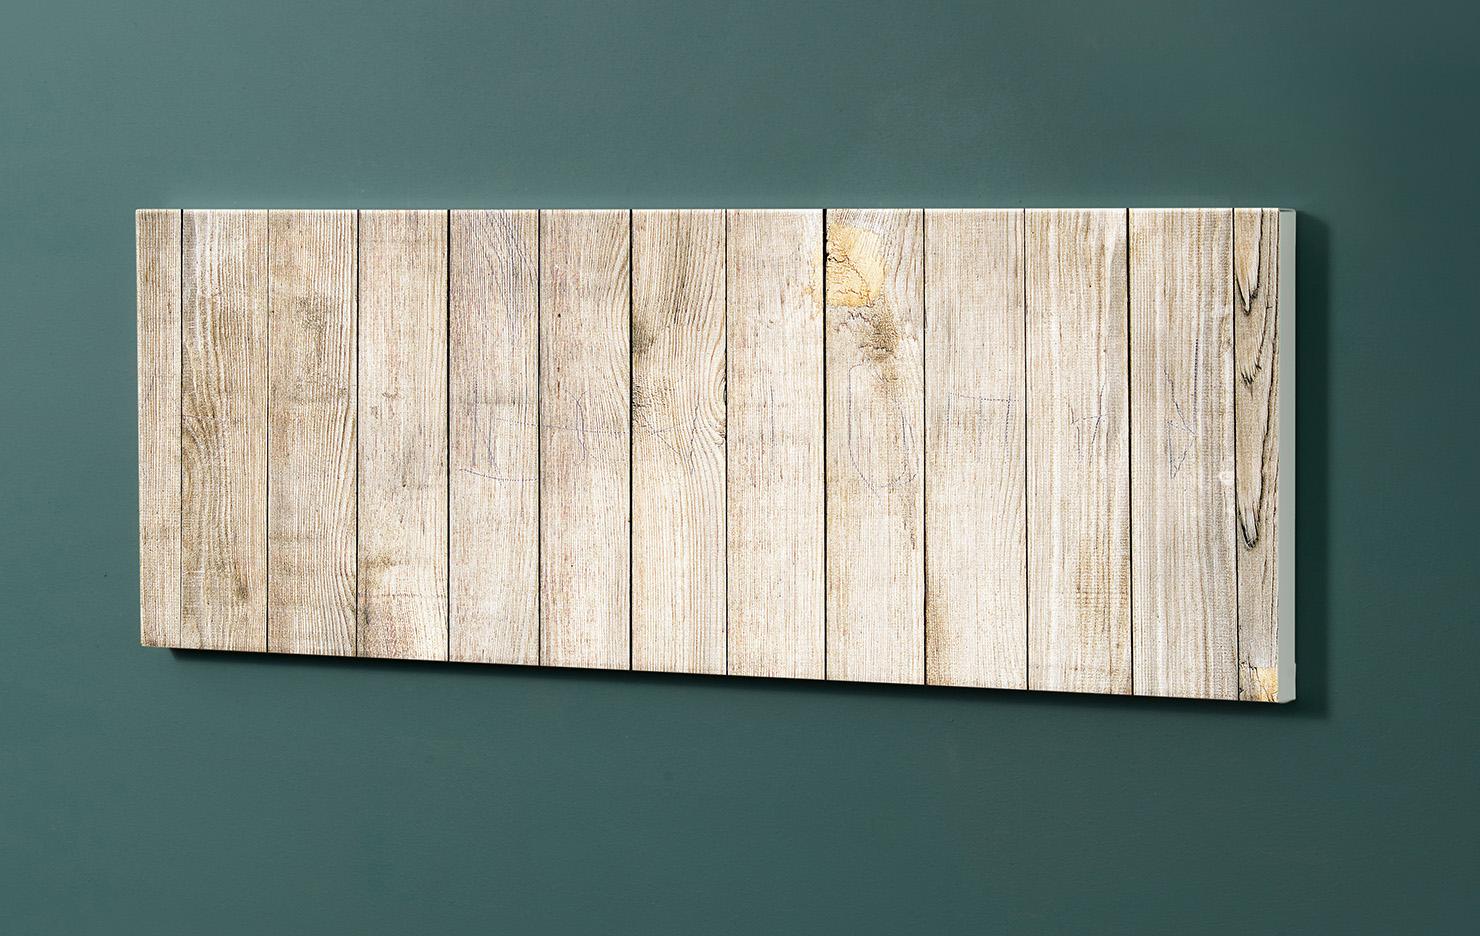 Magnettafel NOTIZ 90x30cm Motiv-Pinnwand M07 Holzbretter Vintage